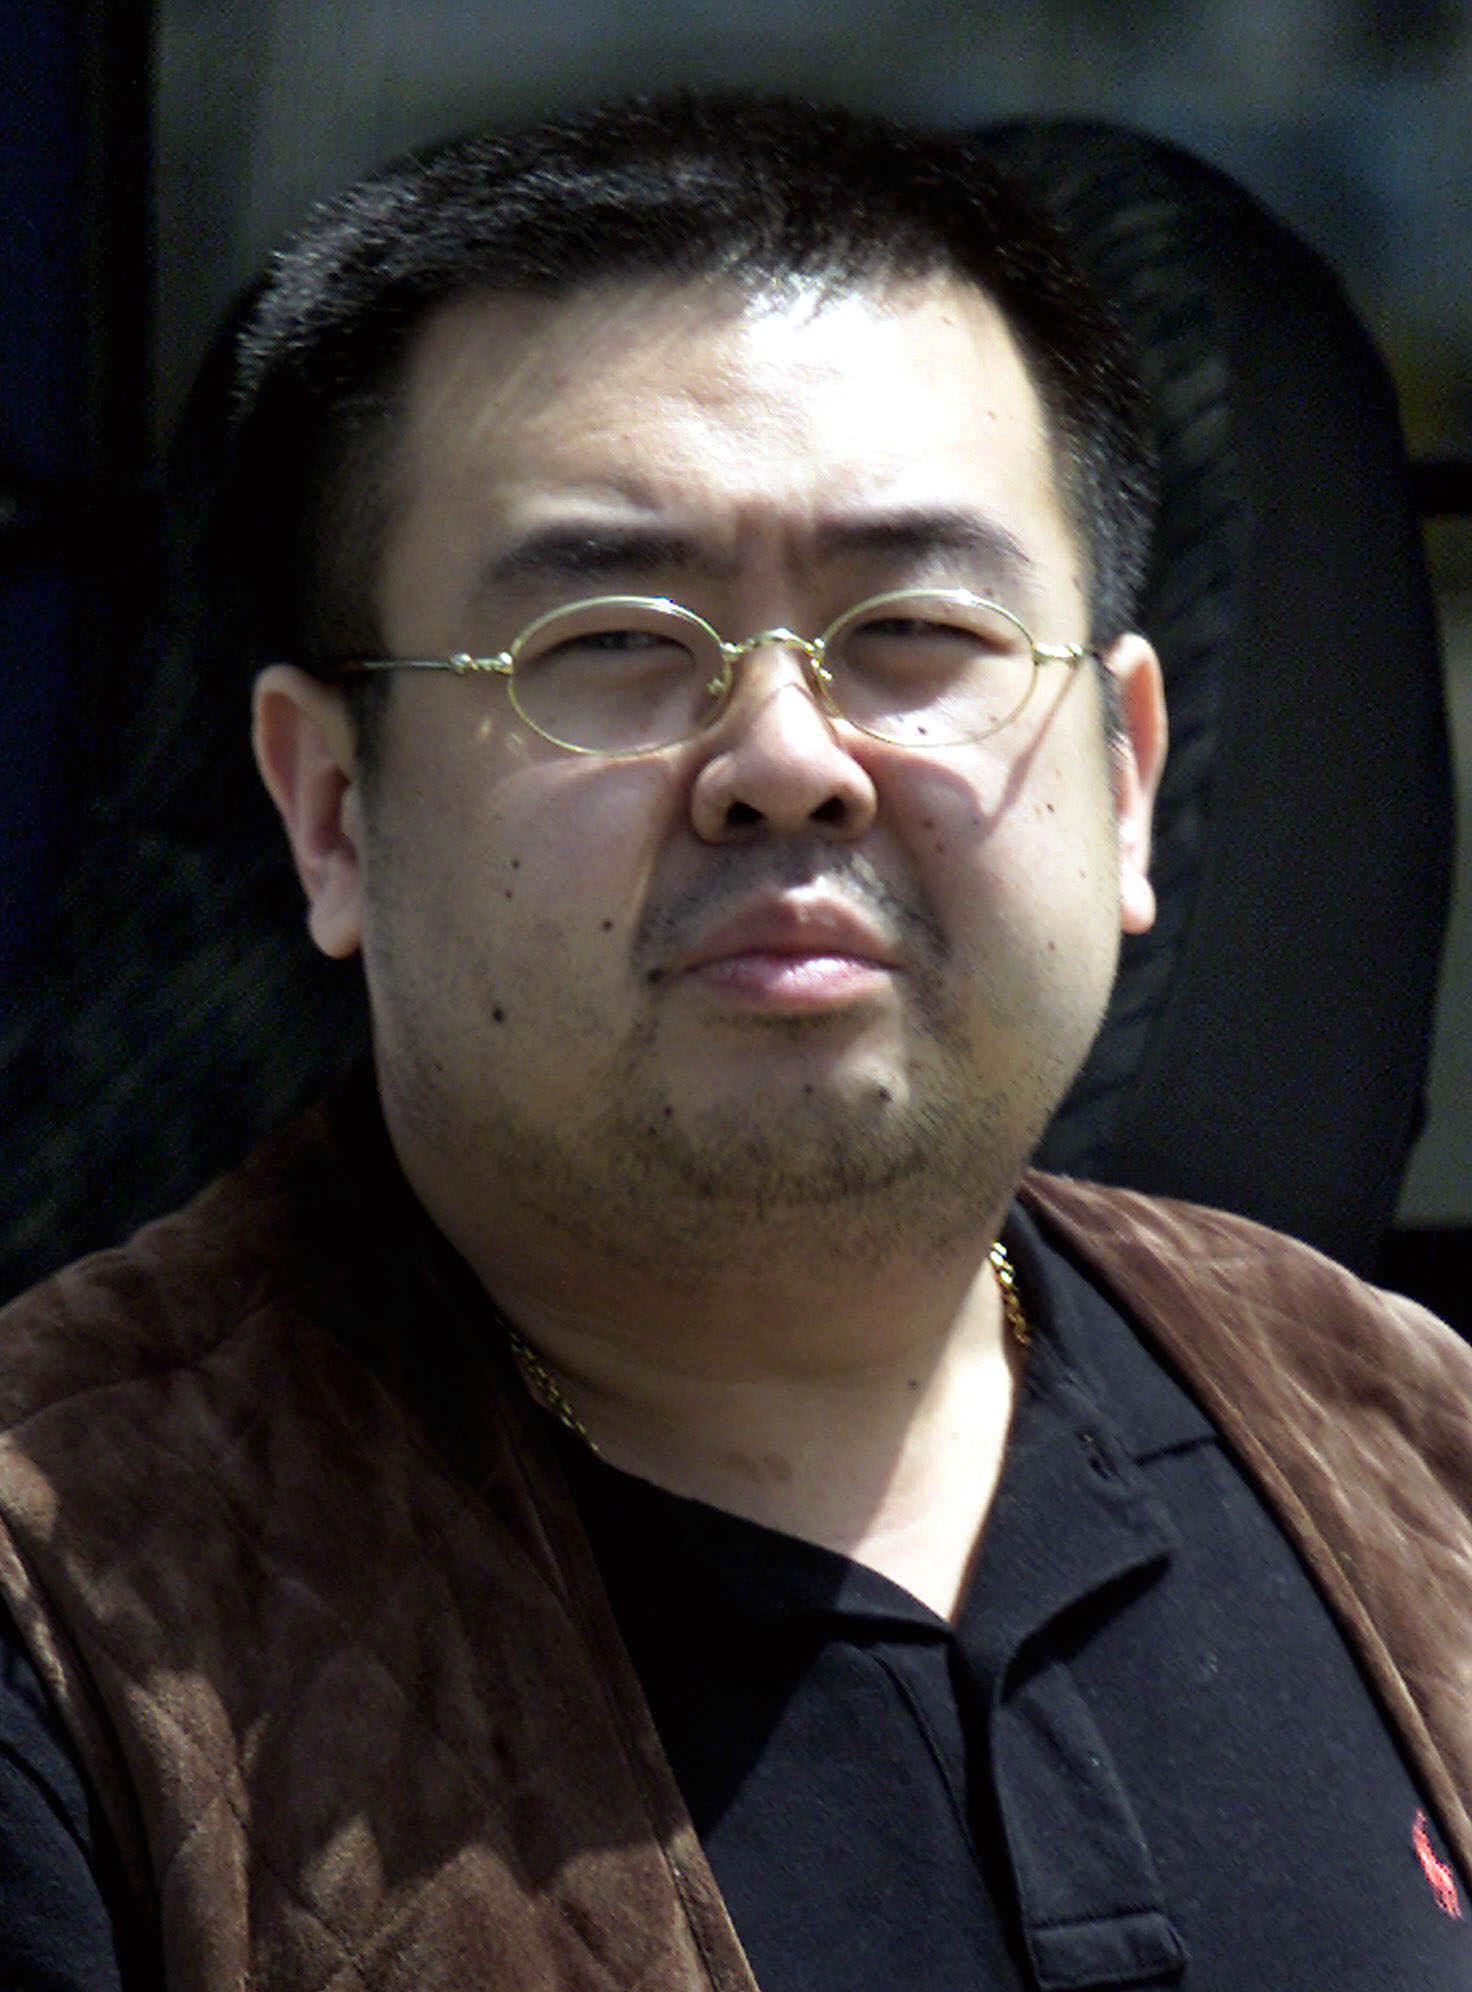 MAN BELIEVED TO BE KIM JONG NAM